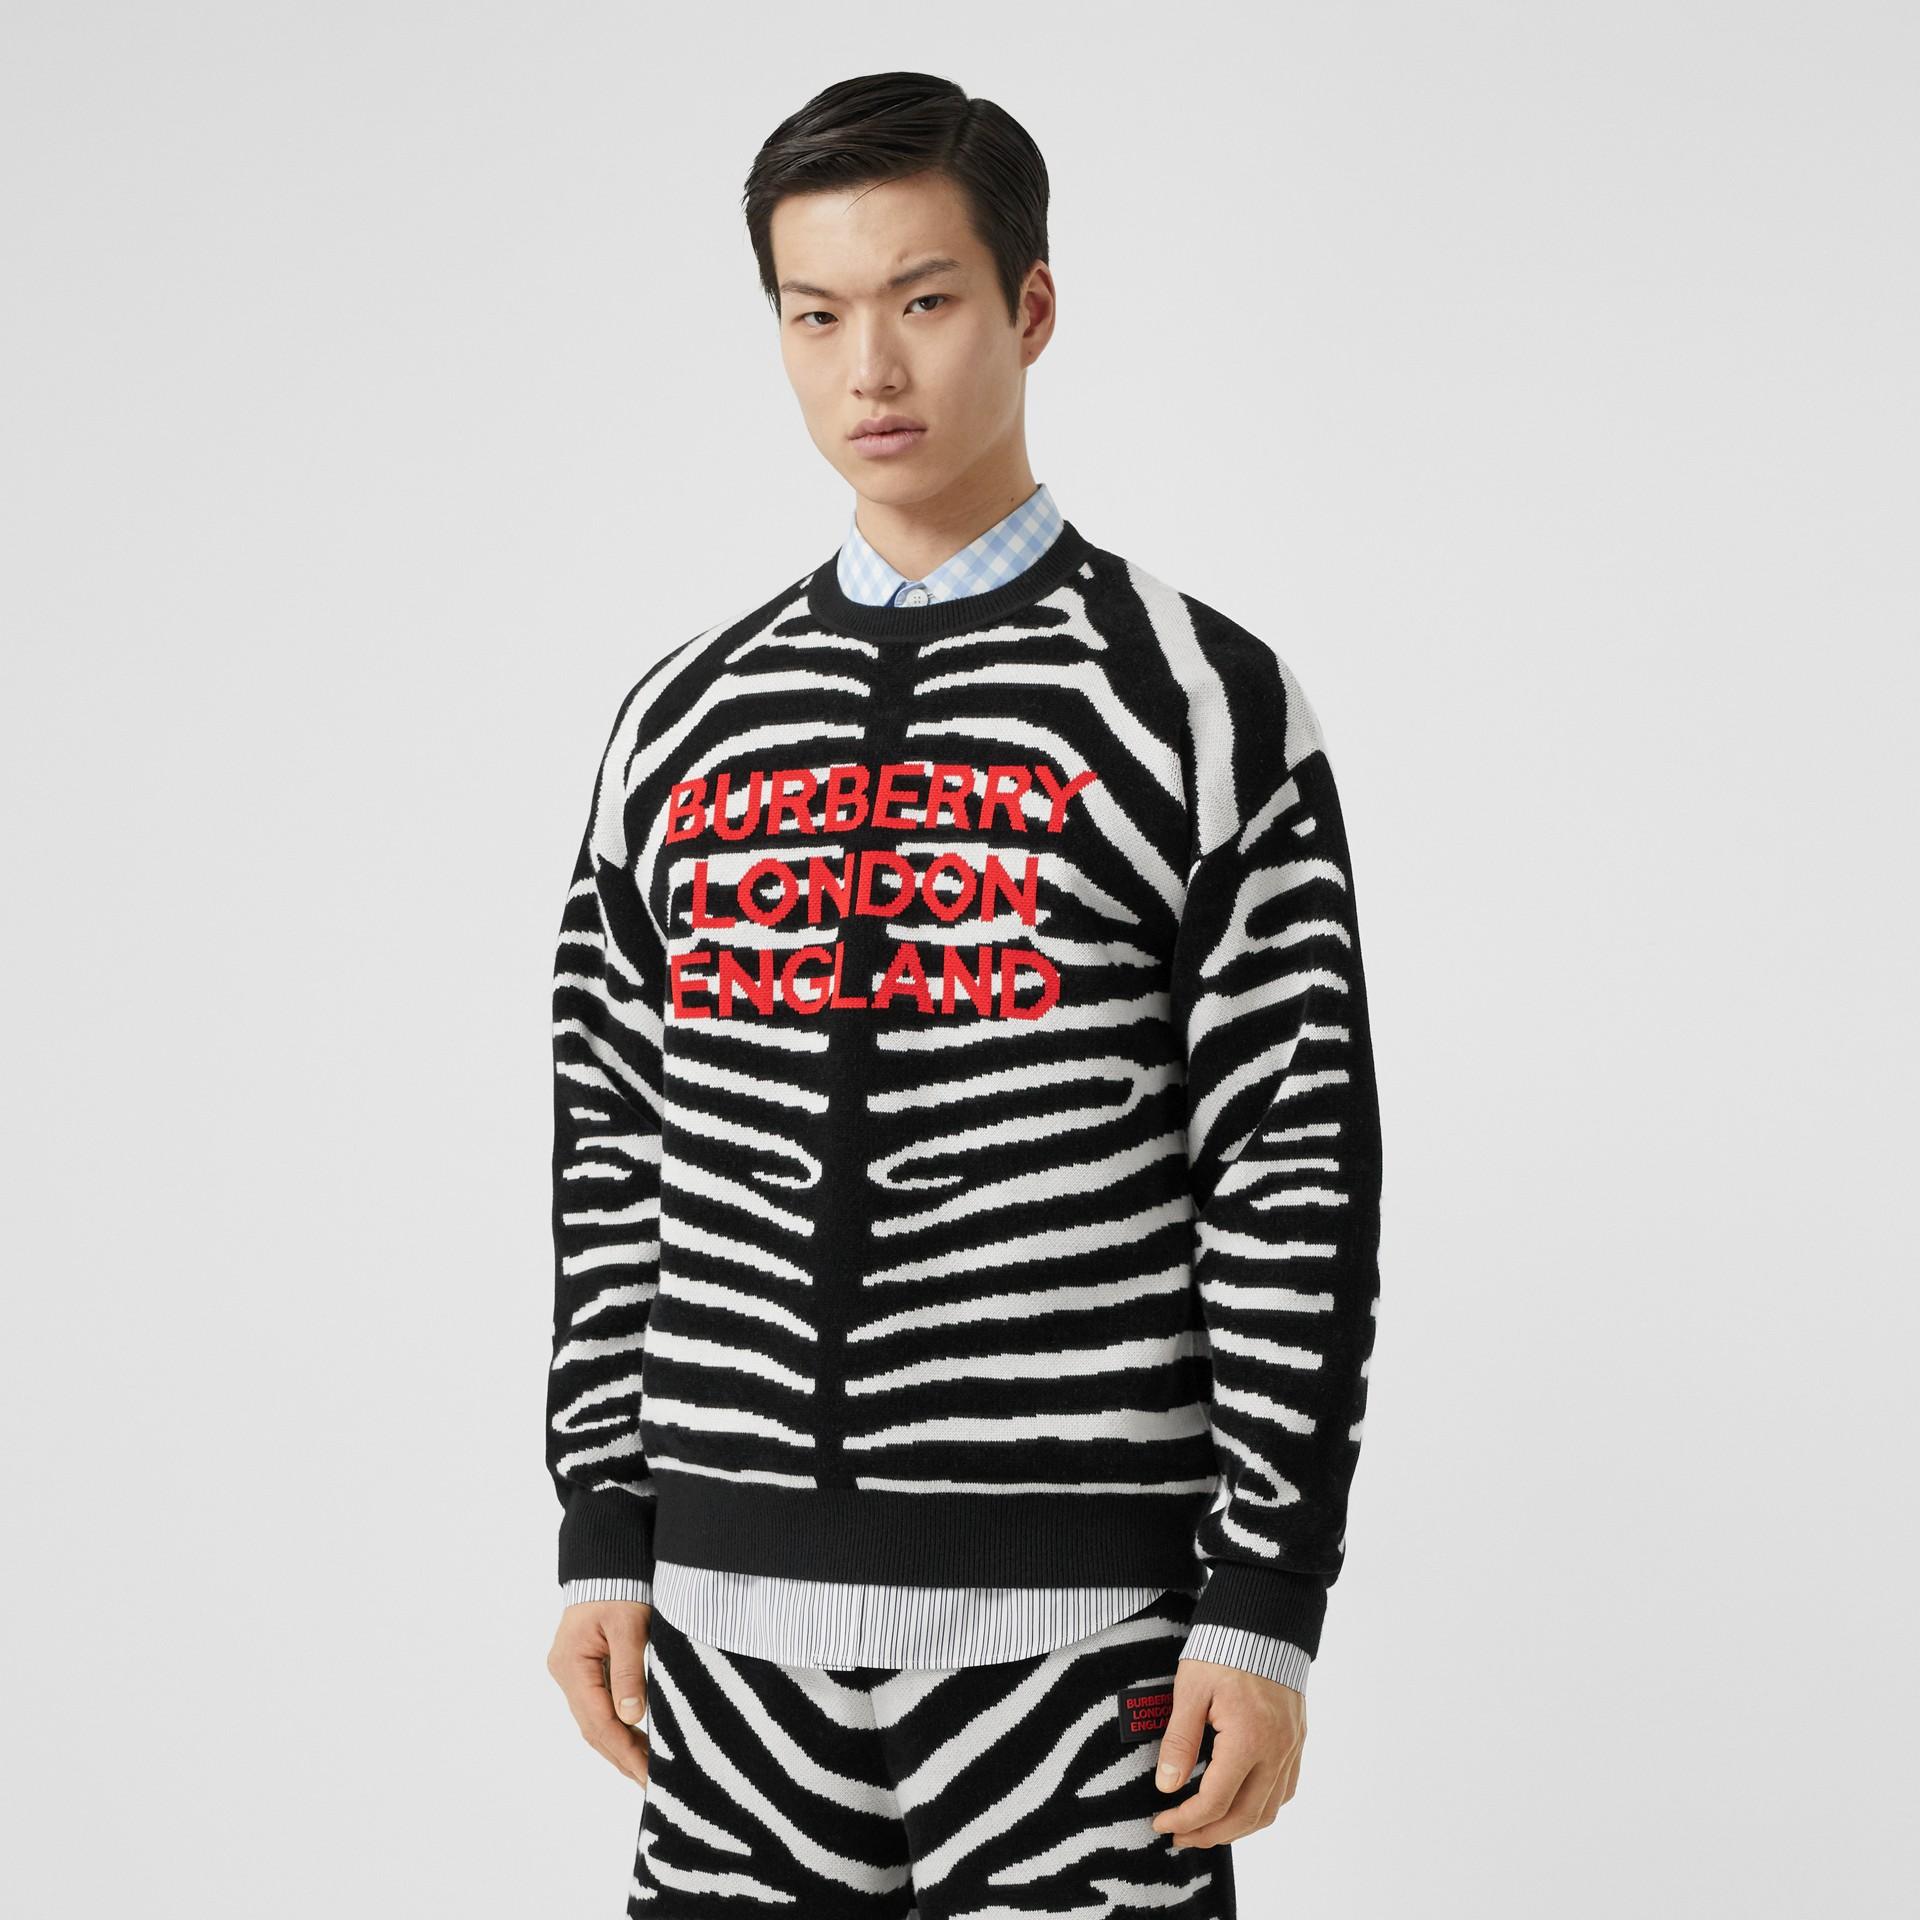 Zebra and Logo Wool Blend Jacquard Sweater in Black | Burberry United Kingdom - gallery image 0